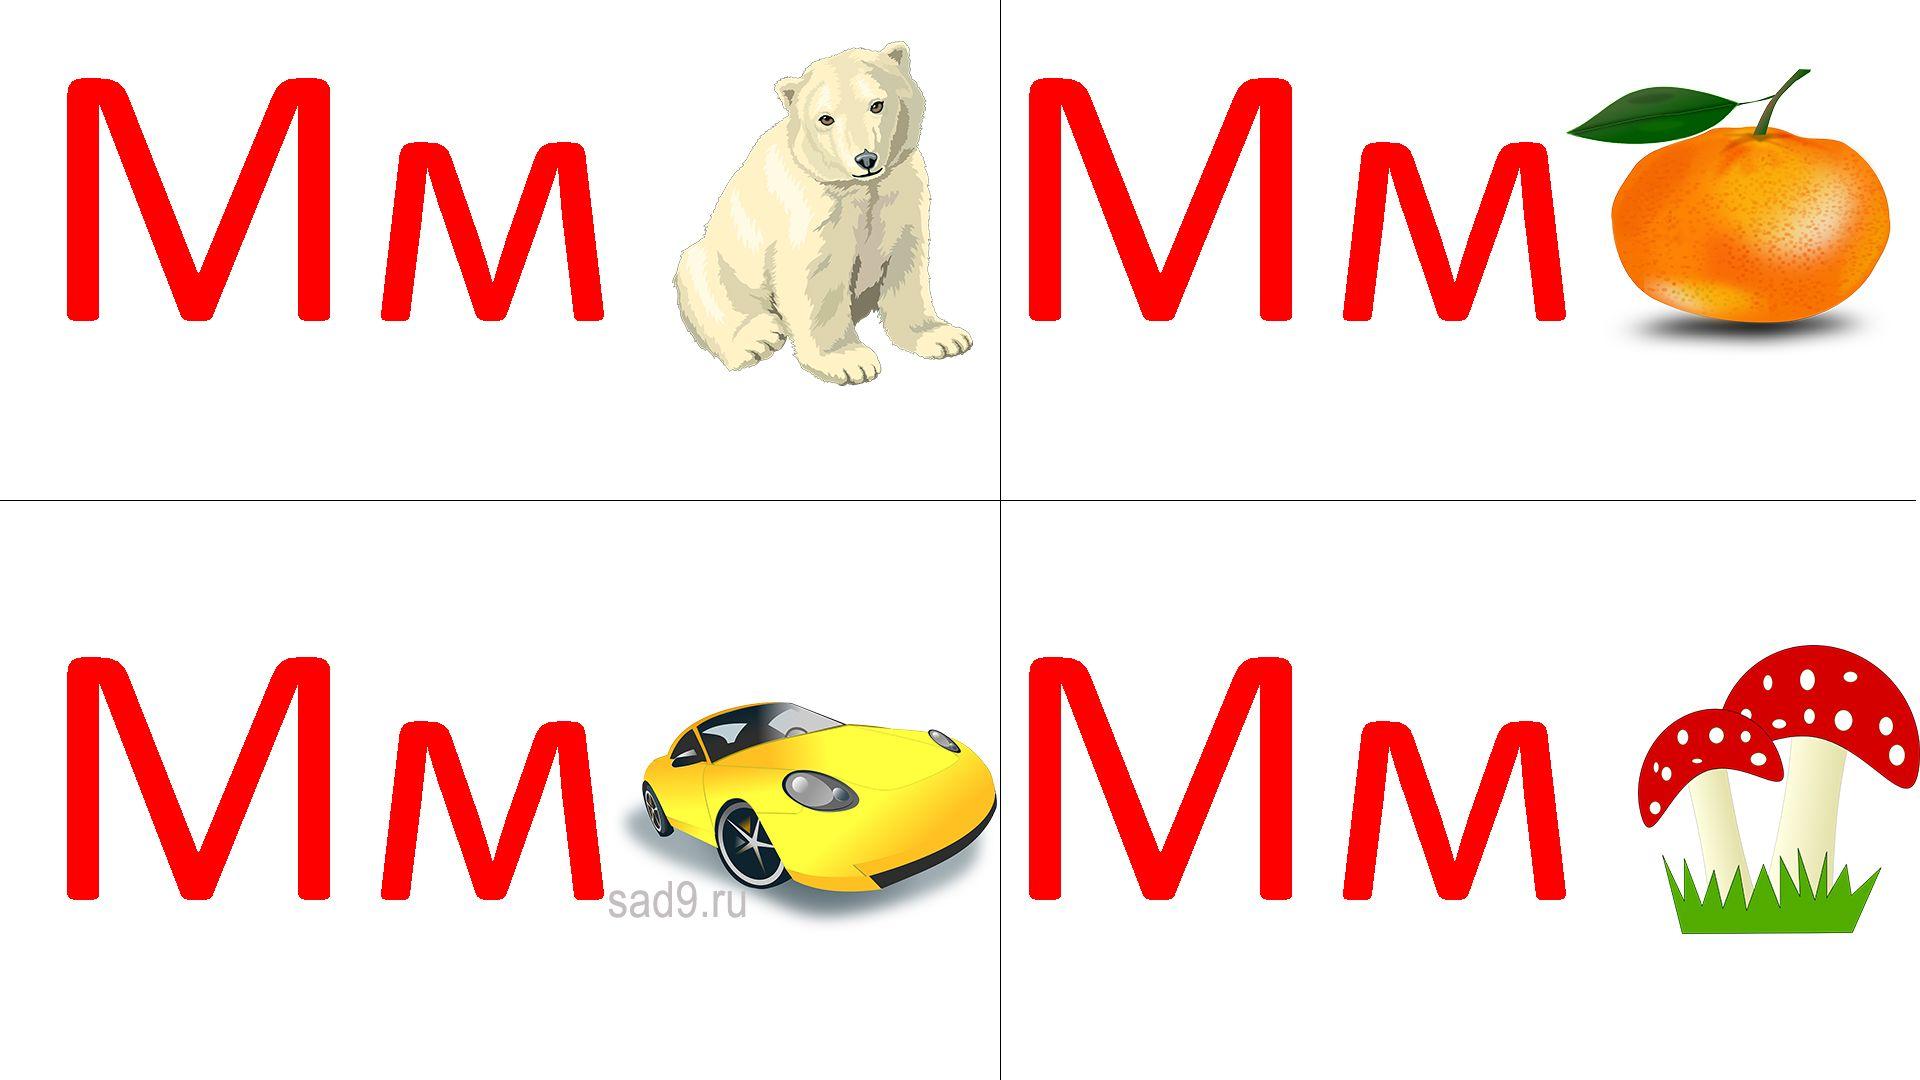 Учим букву М, русский алфавит